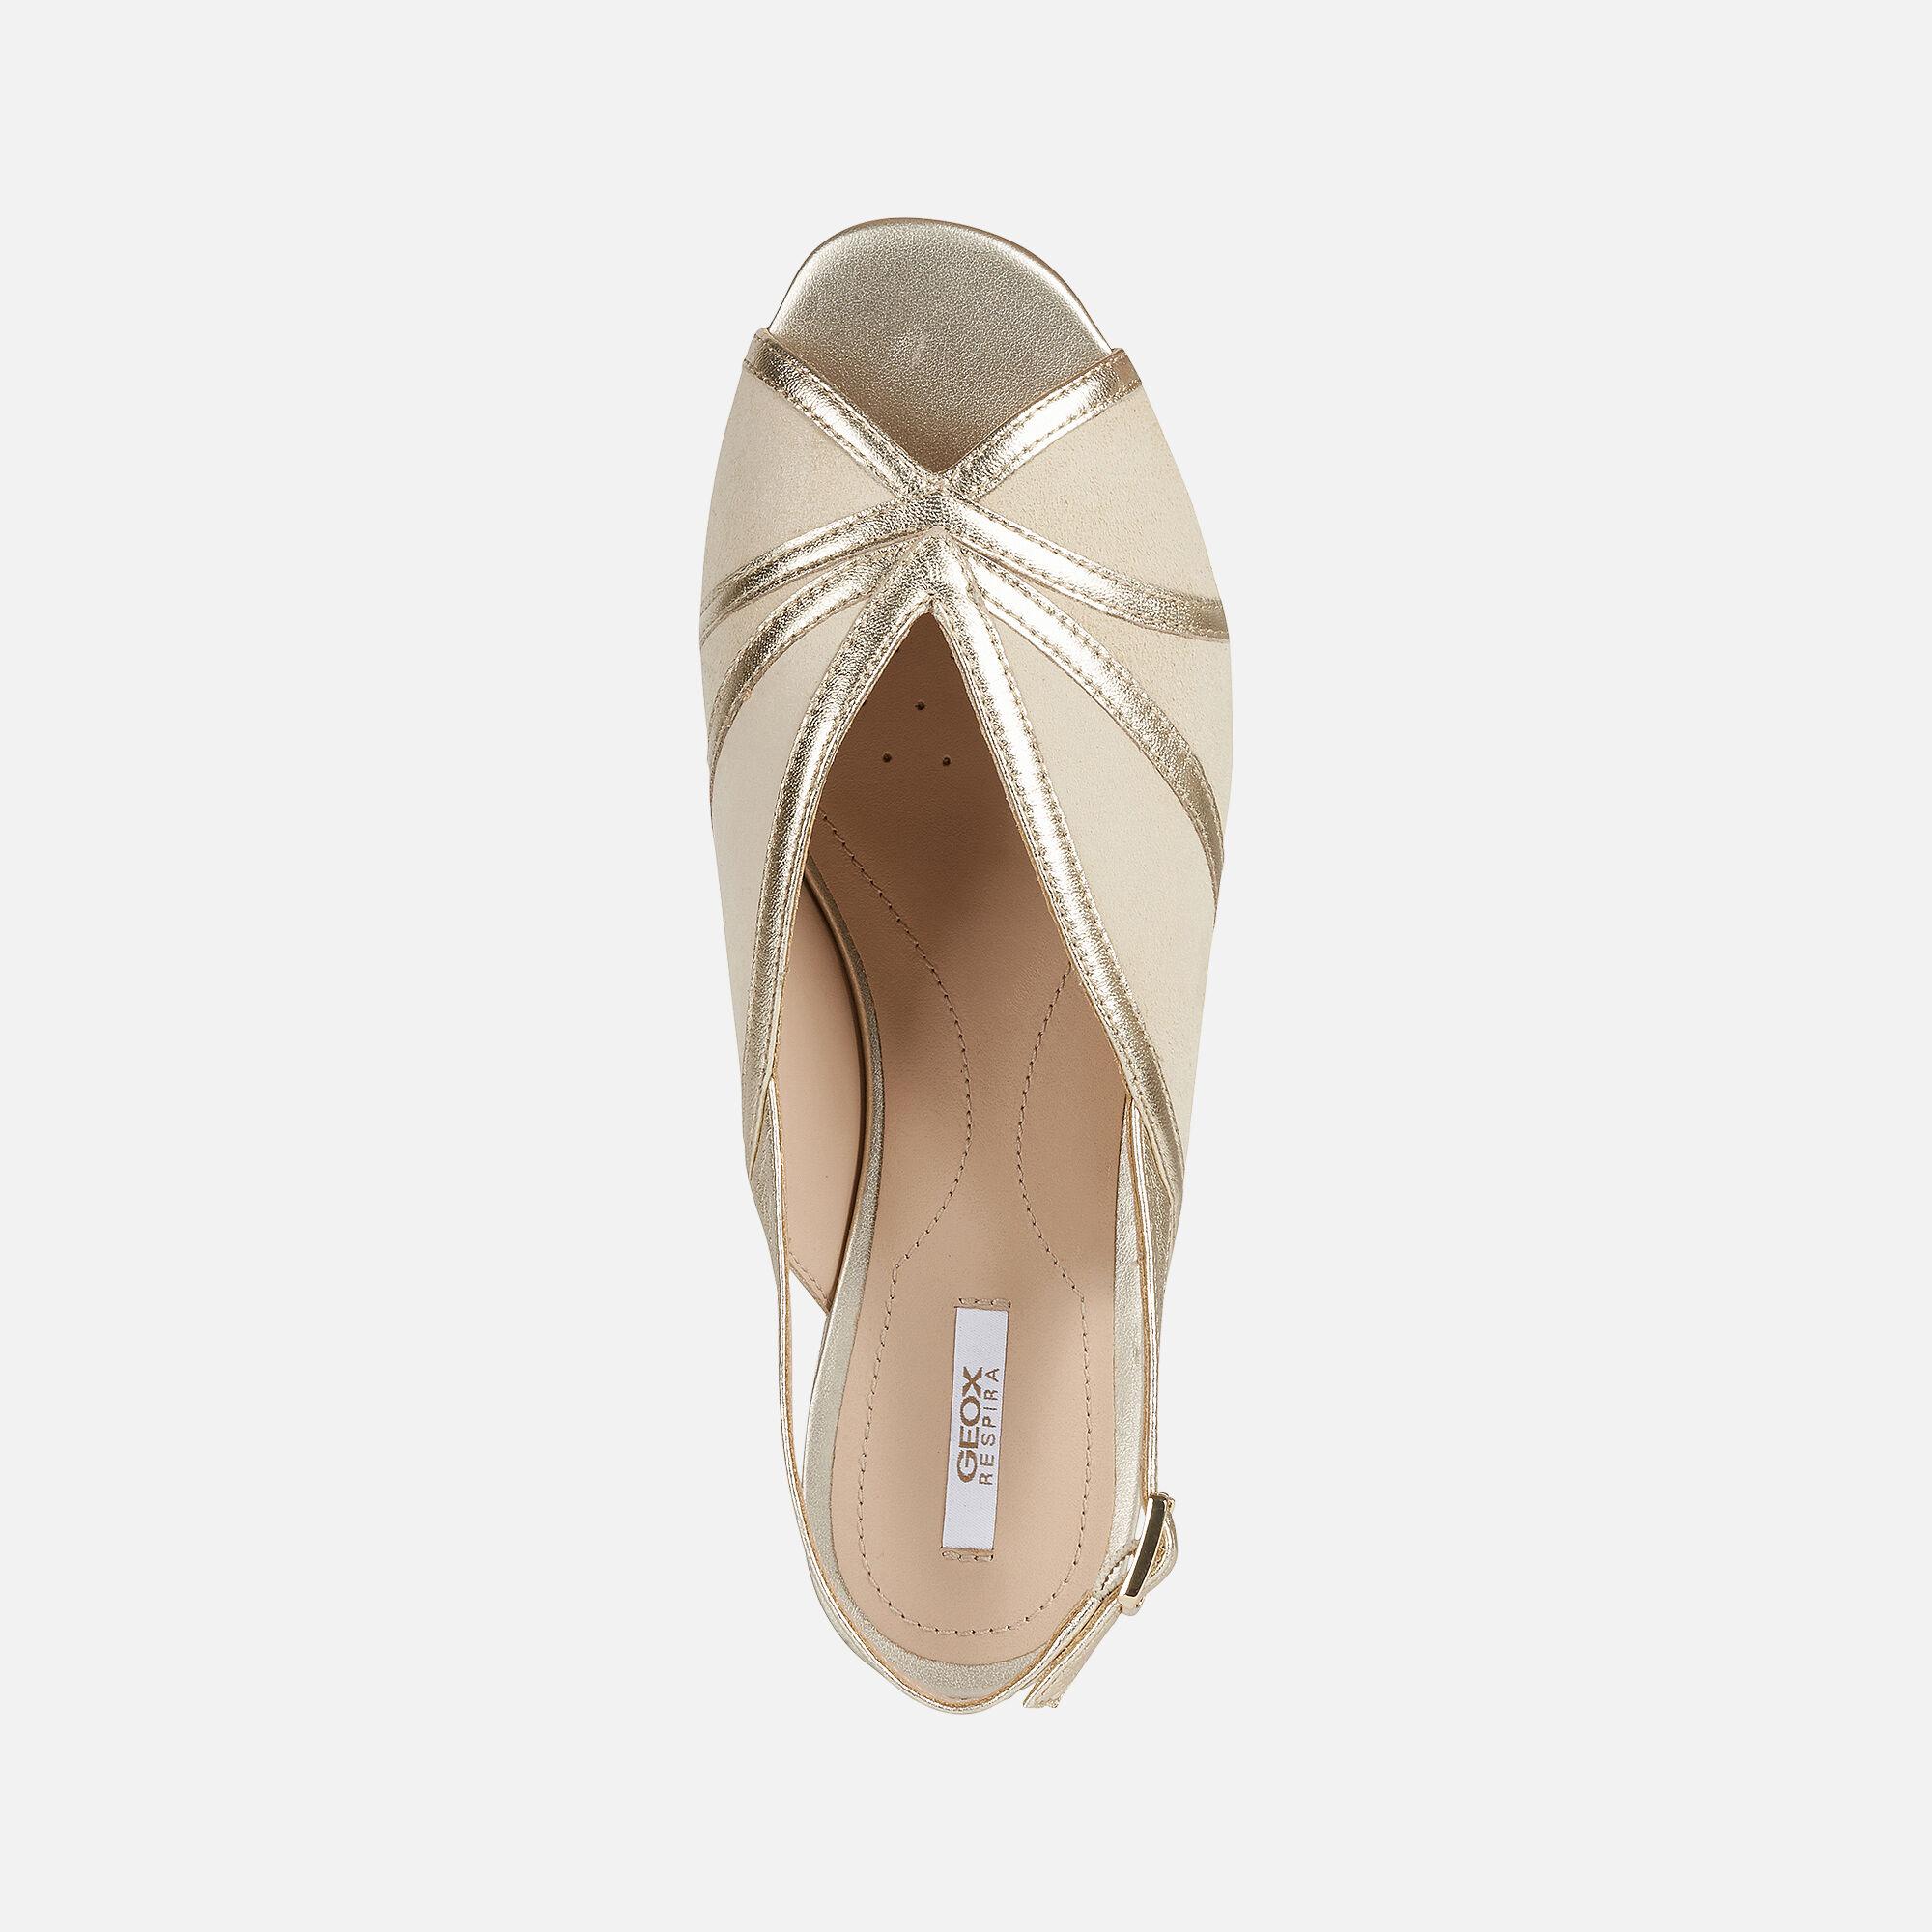 Geox WISTREY Woman: Sand Sandals | Geox SpringSummer